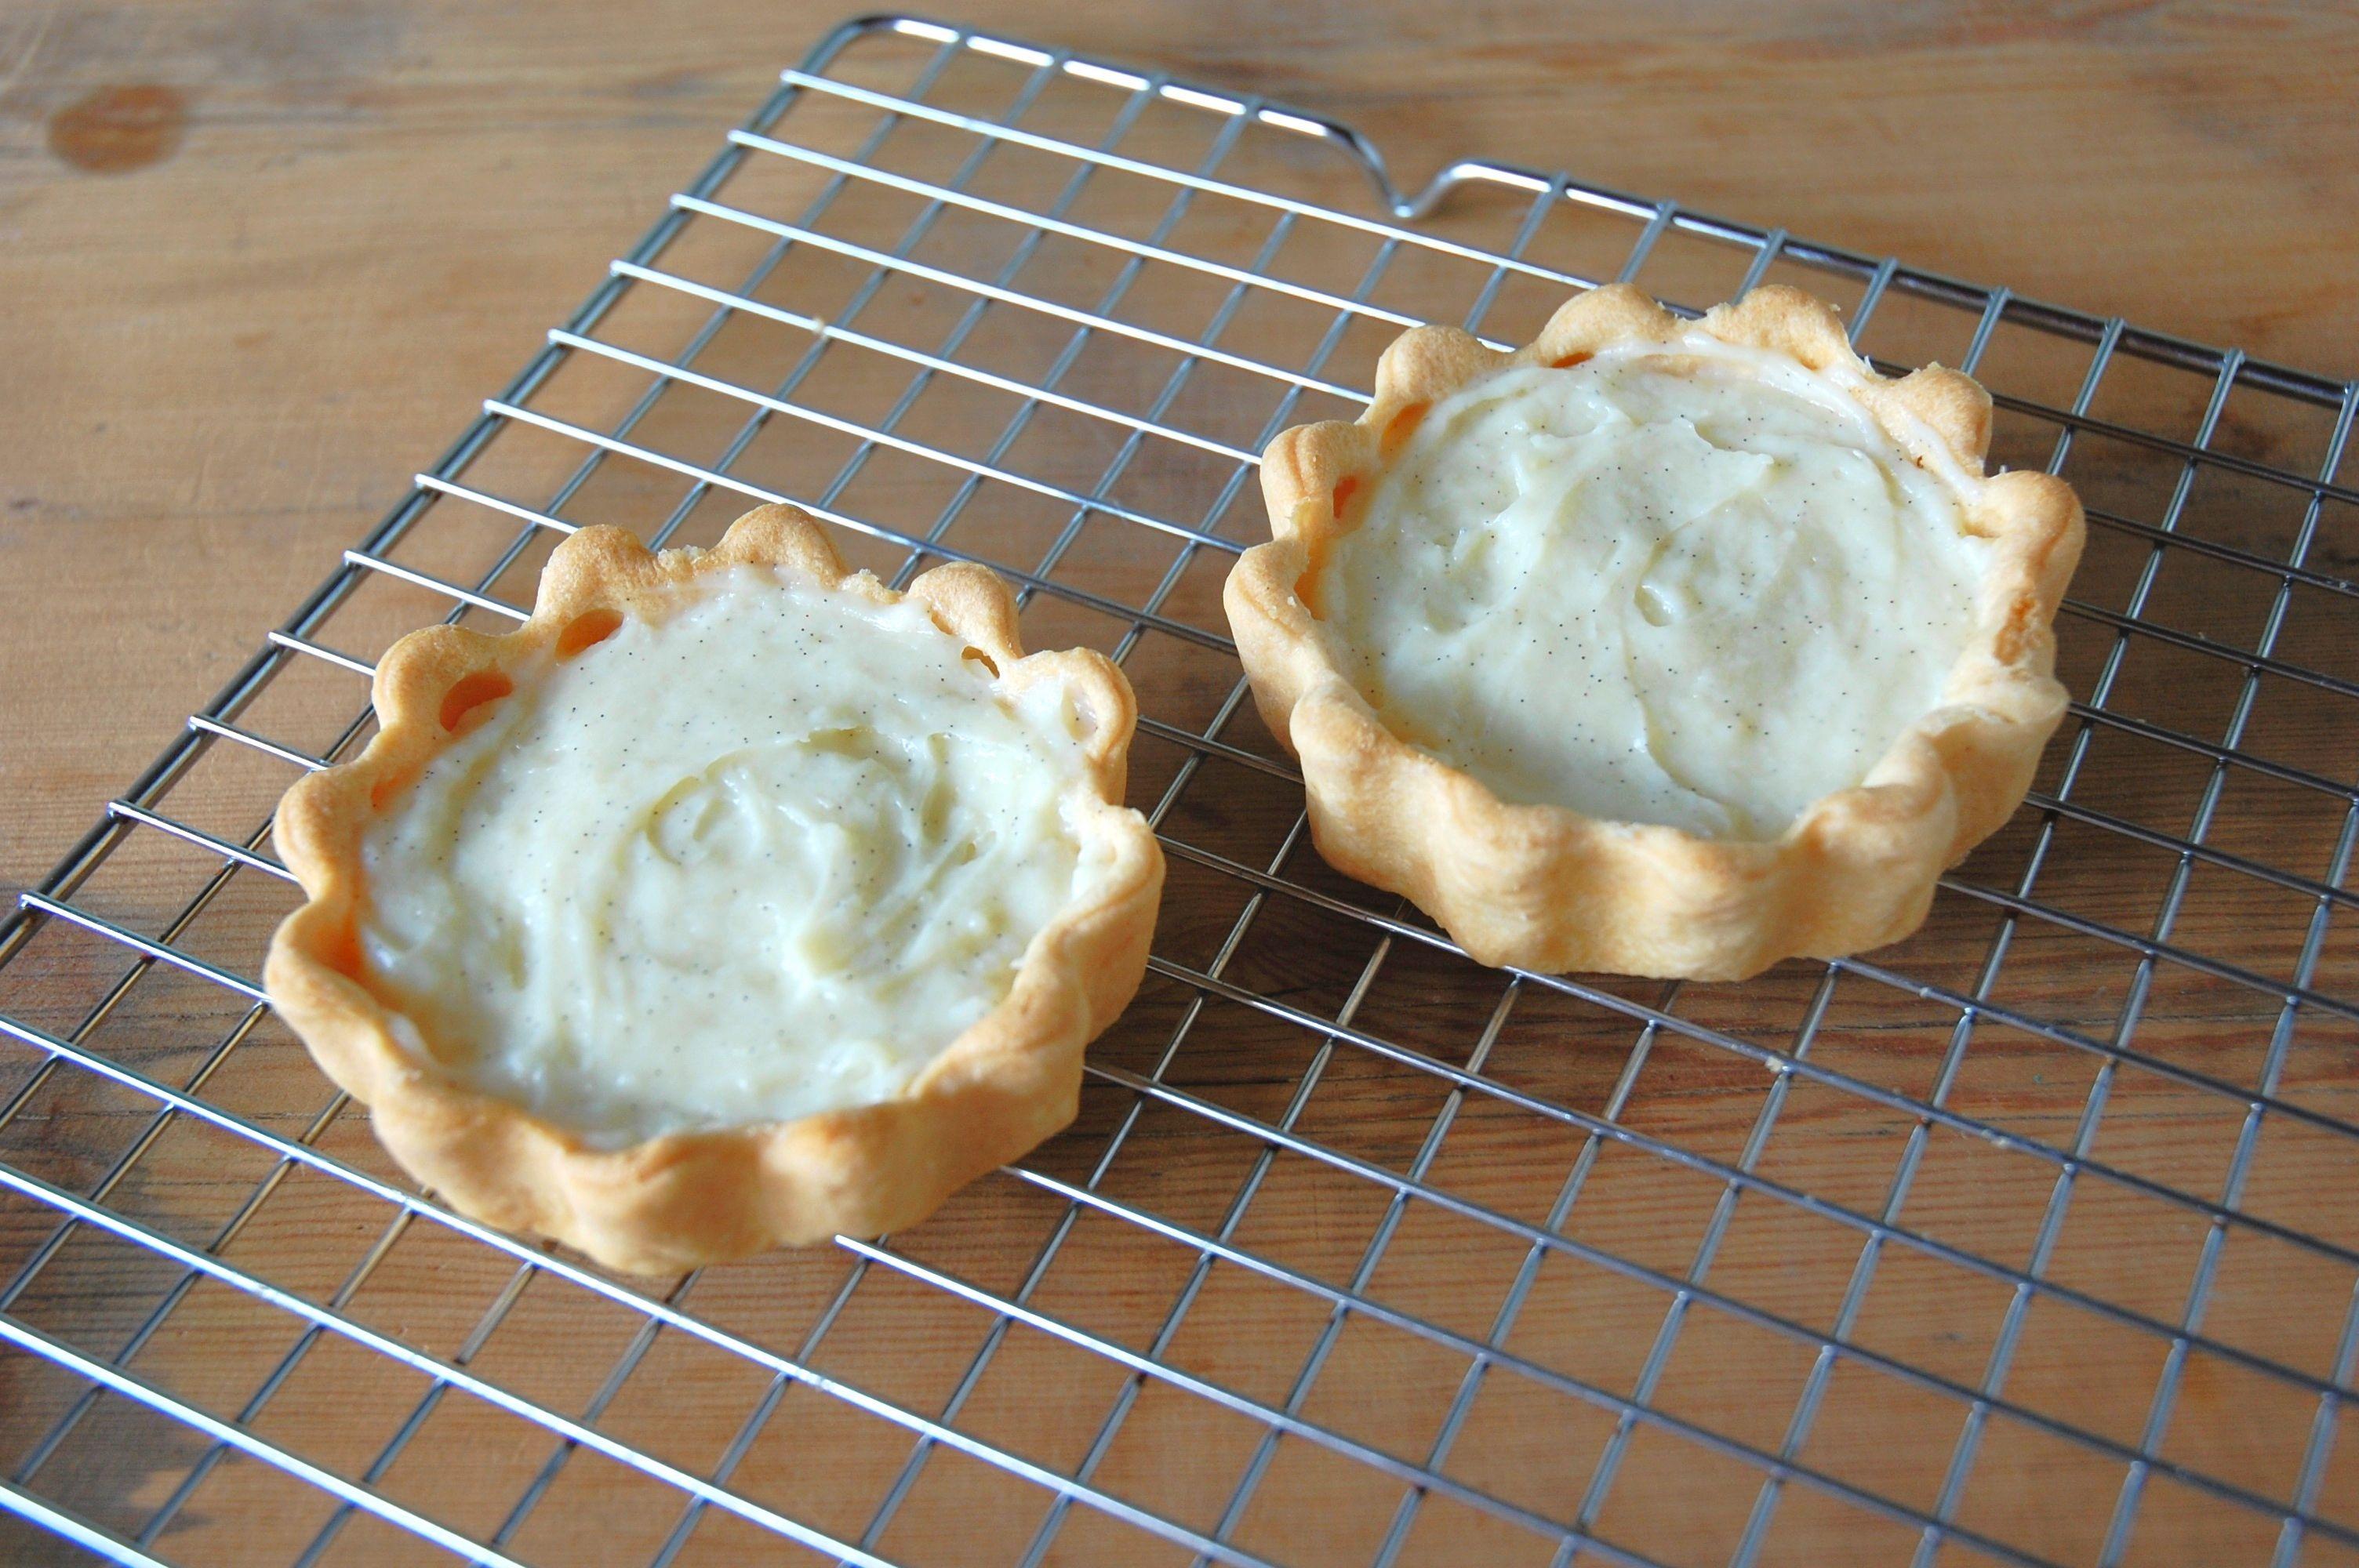 pastry cream/creme patisserie | how to